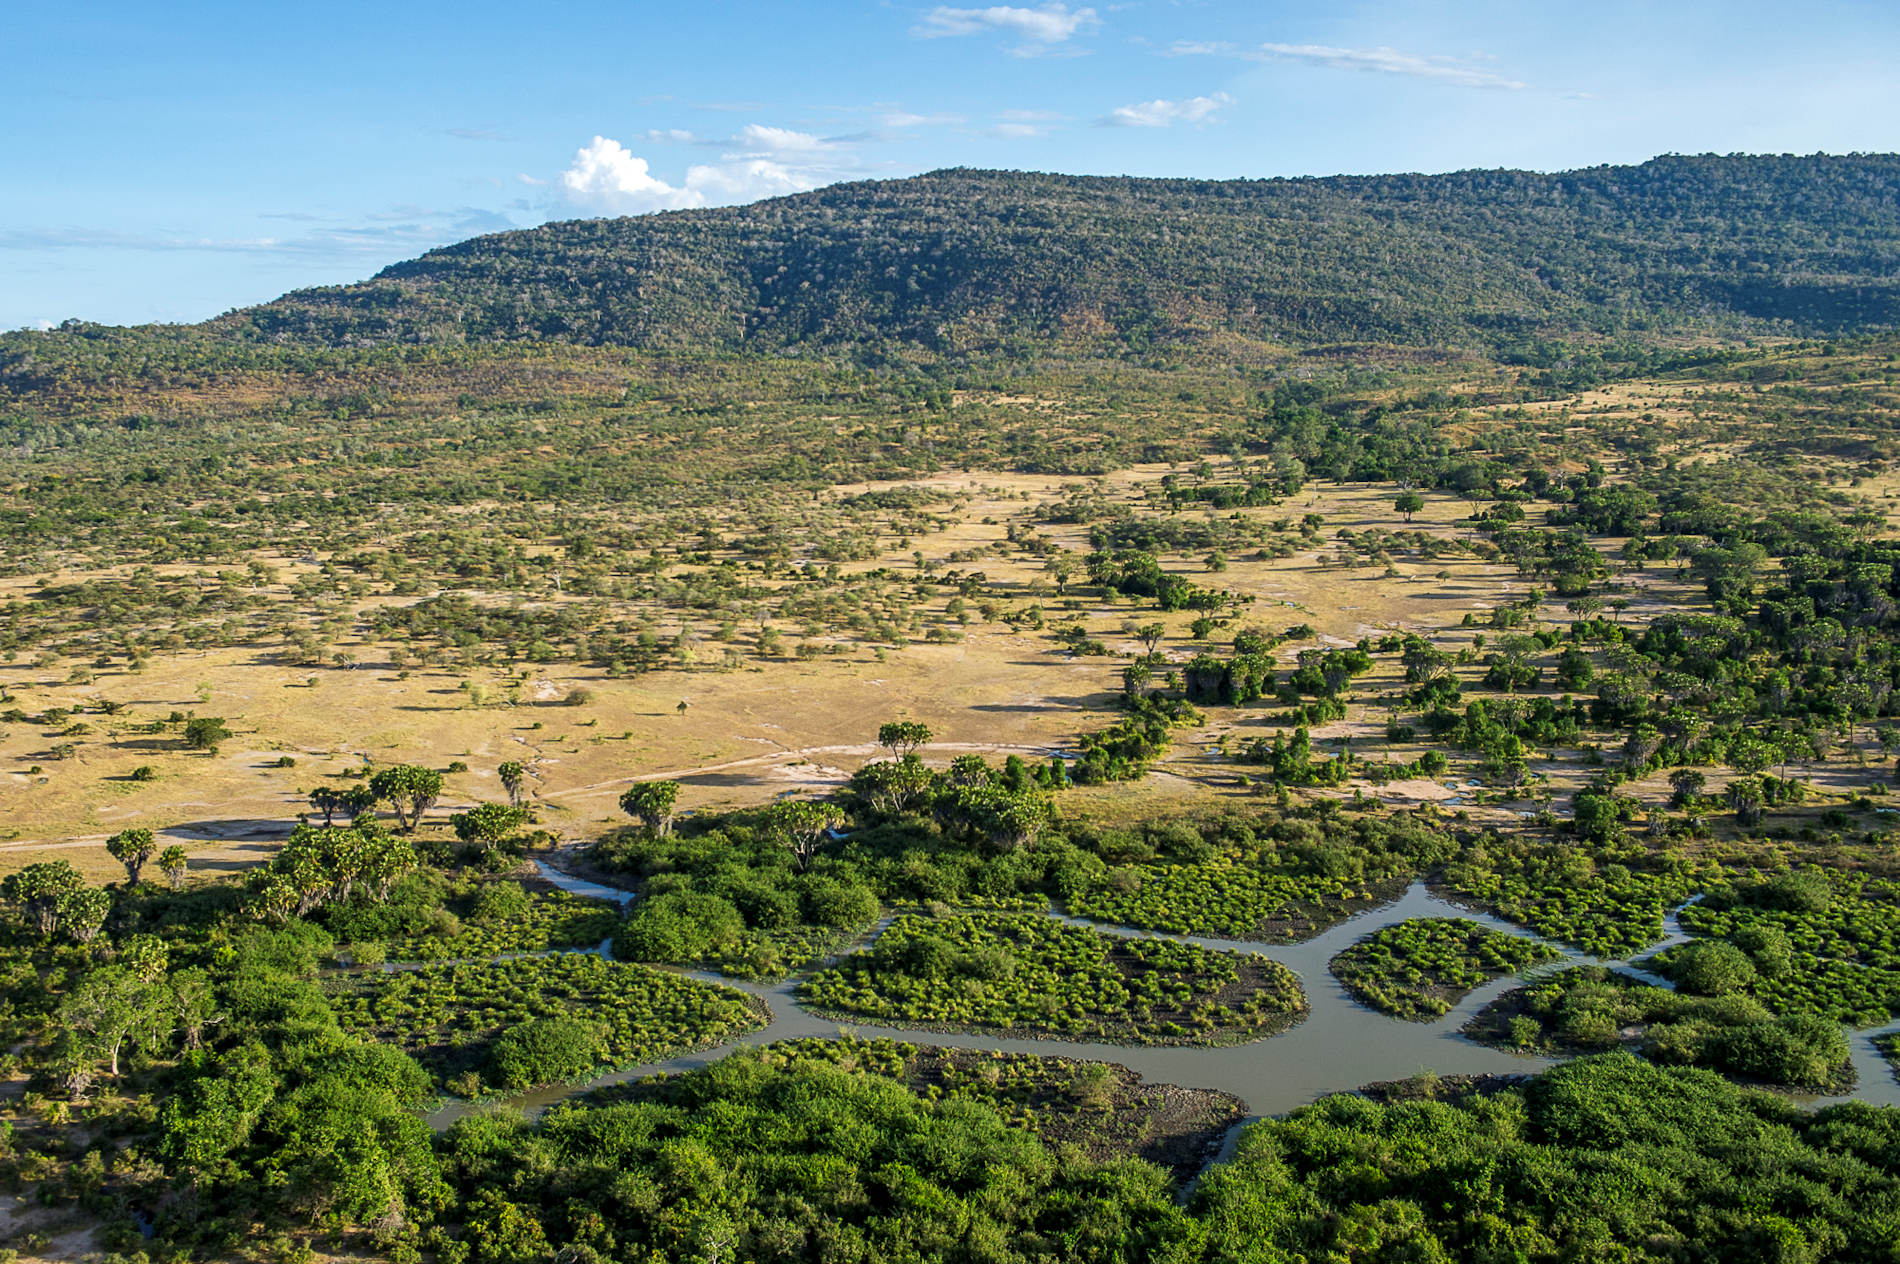 Roho ya Camp Asilia Africa Selous From The Air RR © Robert J. Ross